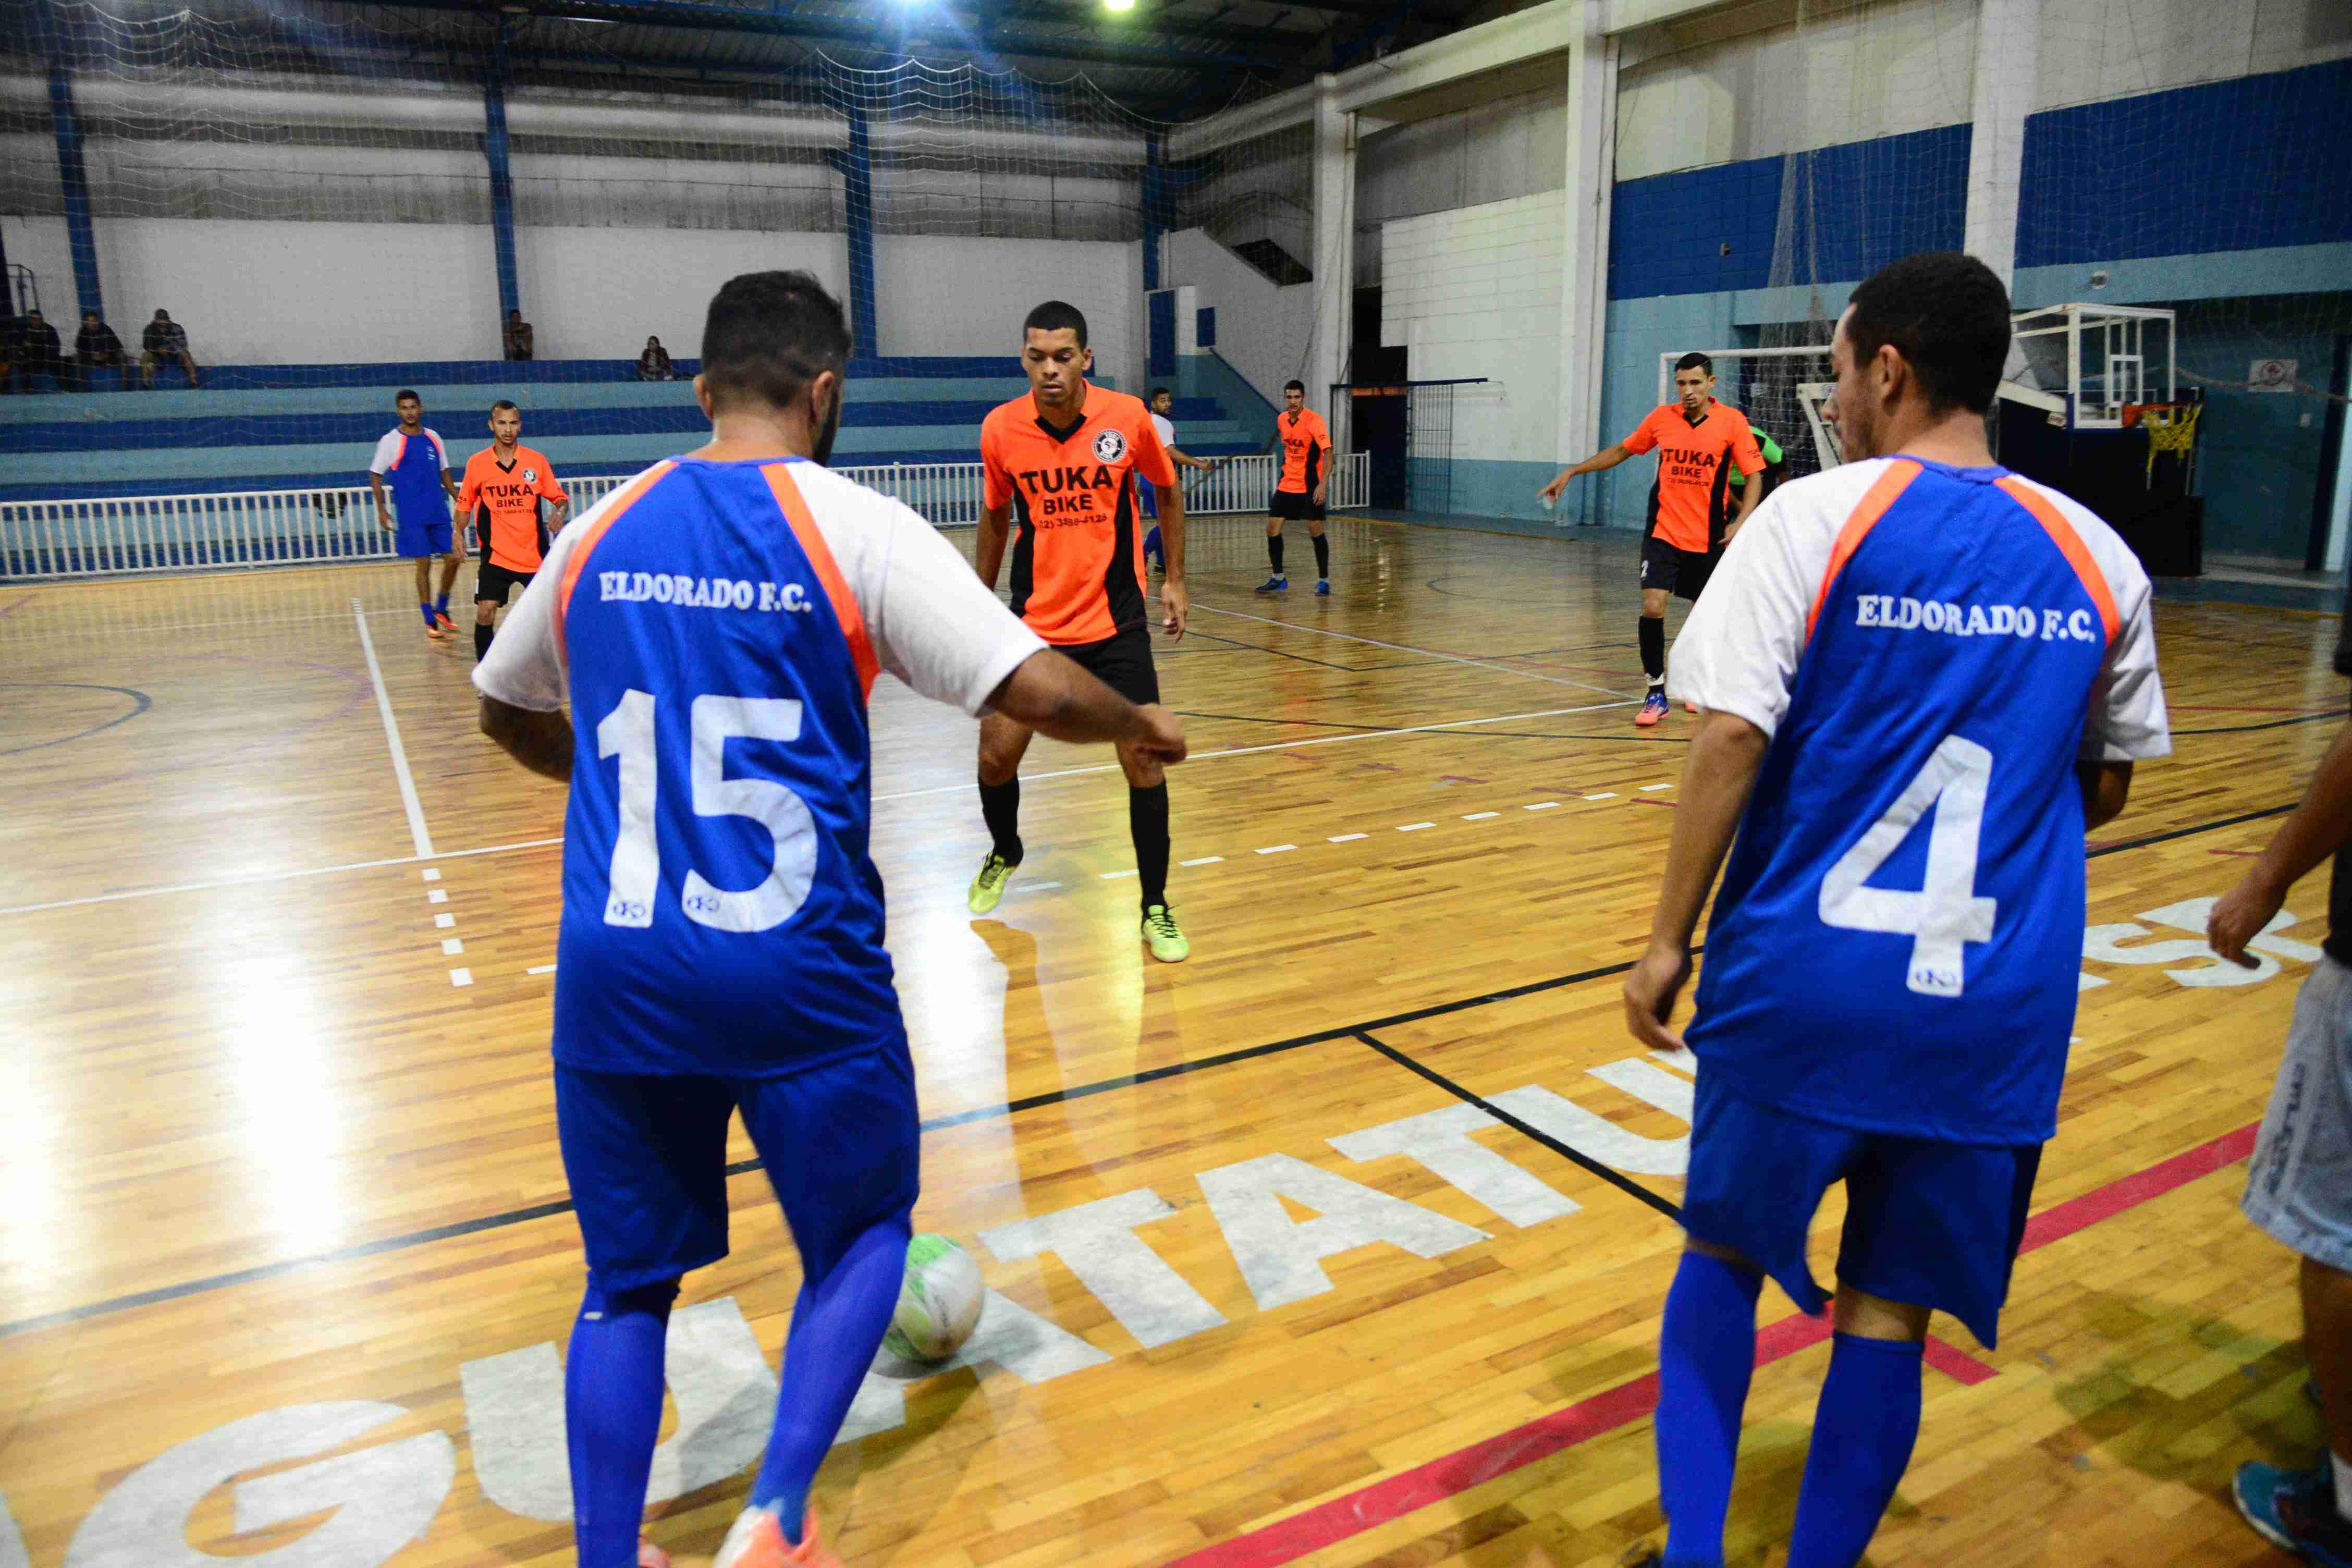 Futsal gatorade - Capa